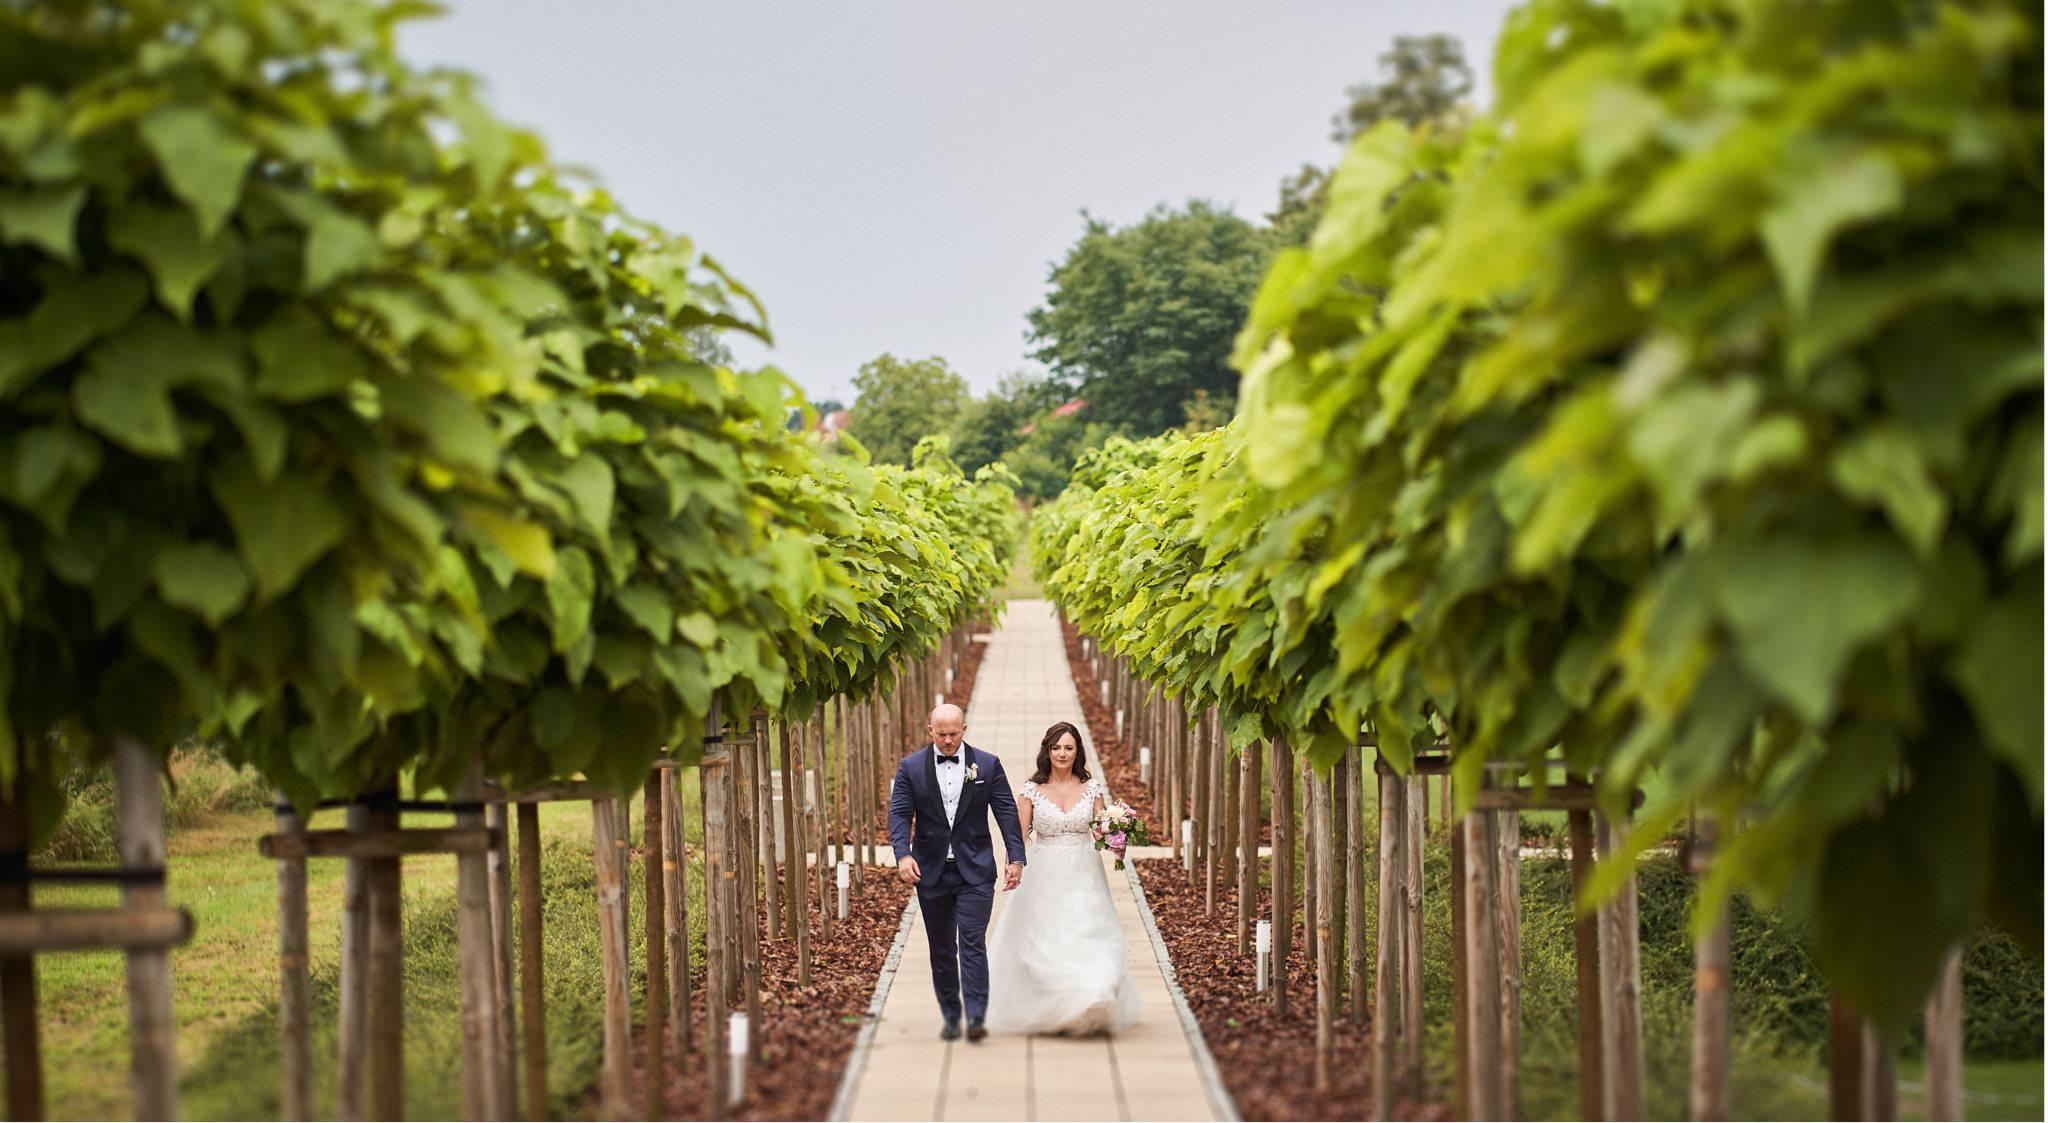 Aneta i David – wesele polsko-niemieckie